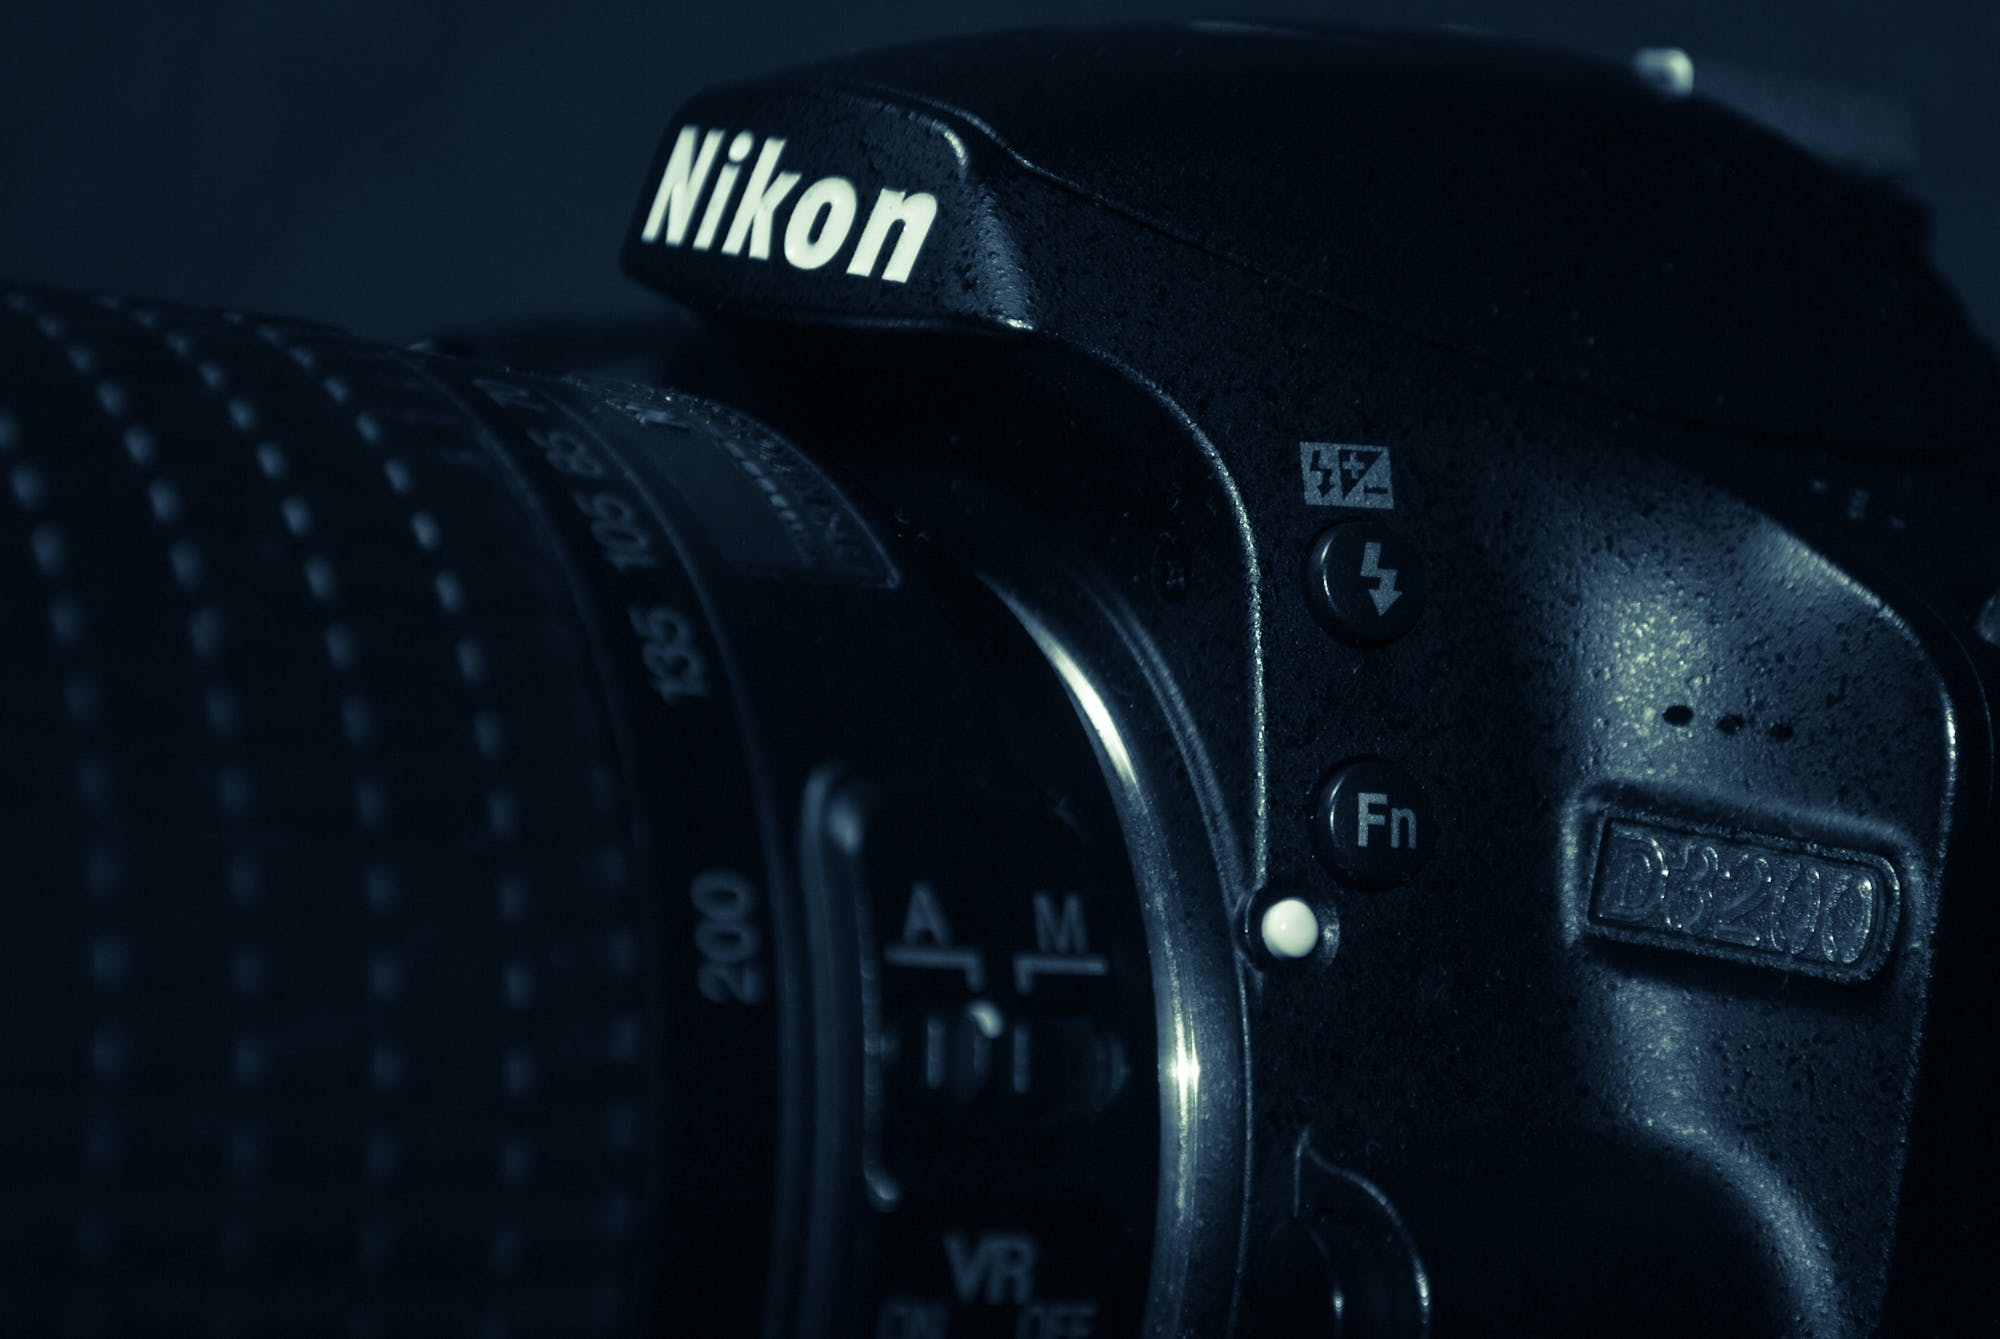 Free stock photo of camera, nikon lens